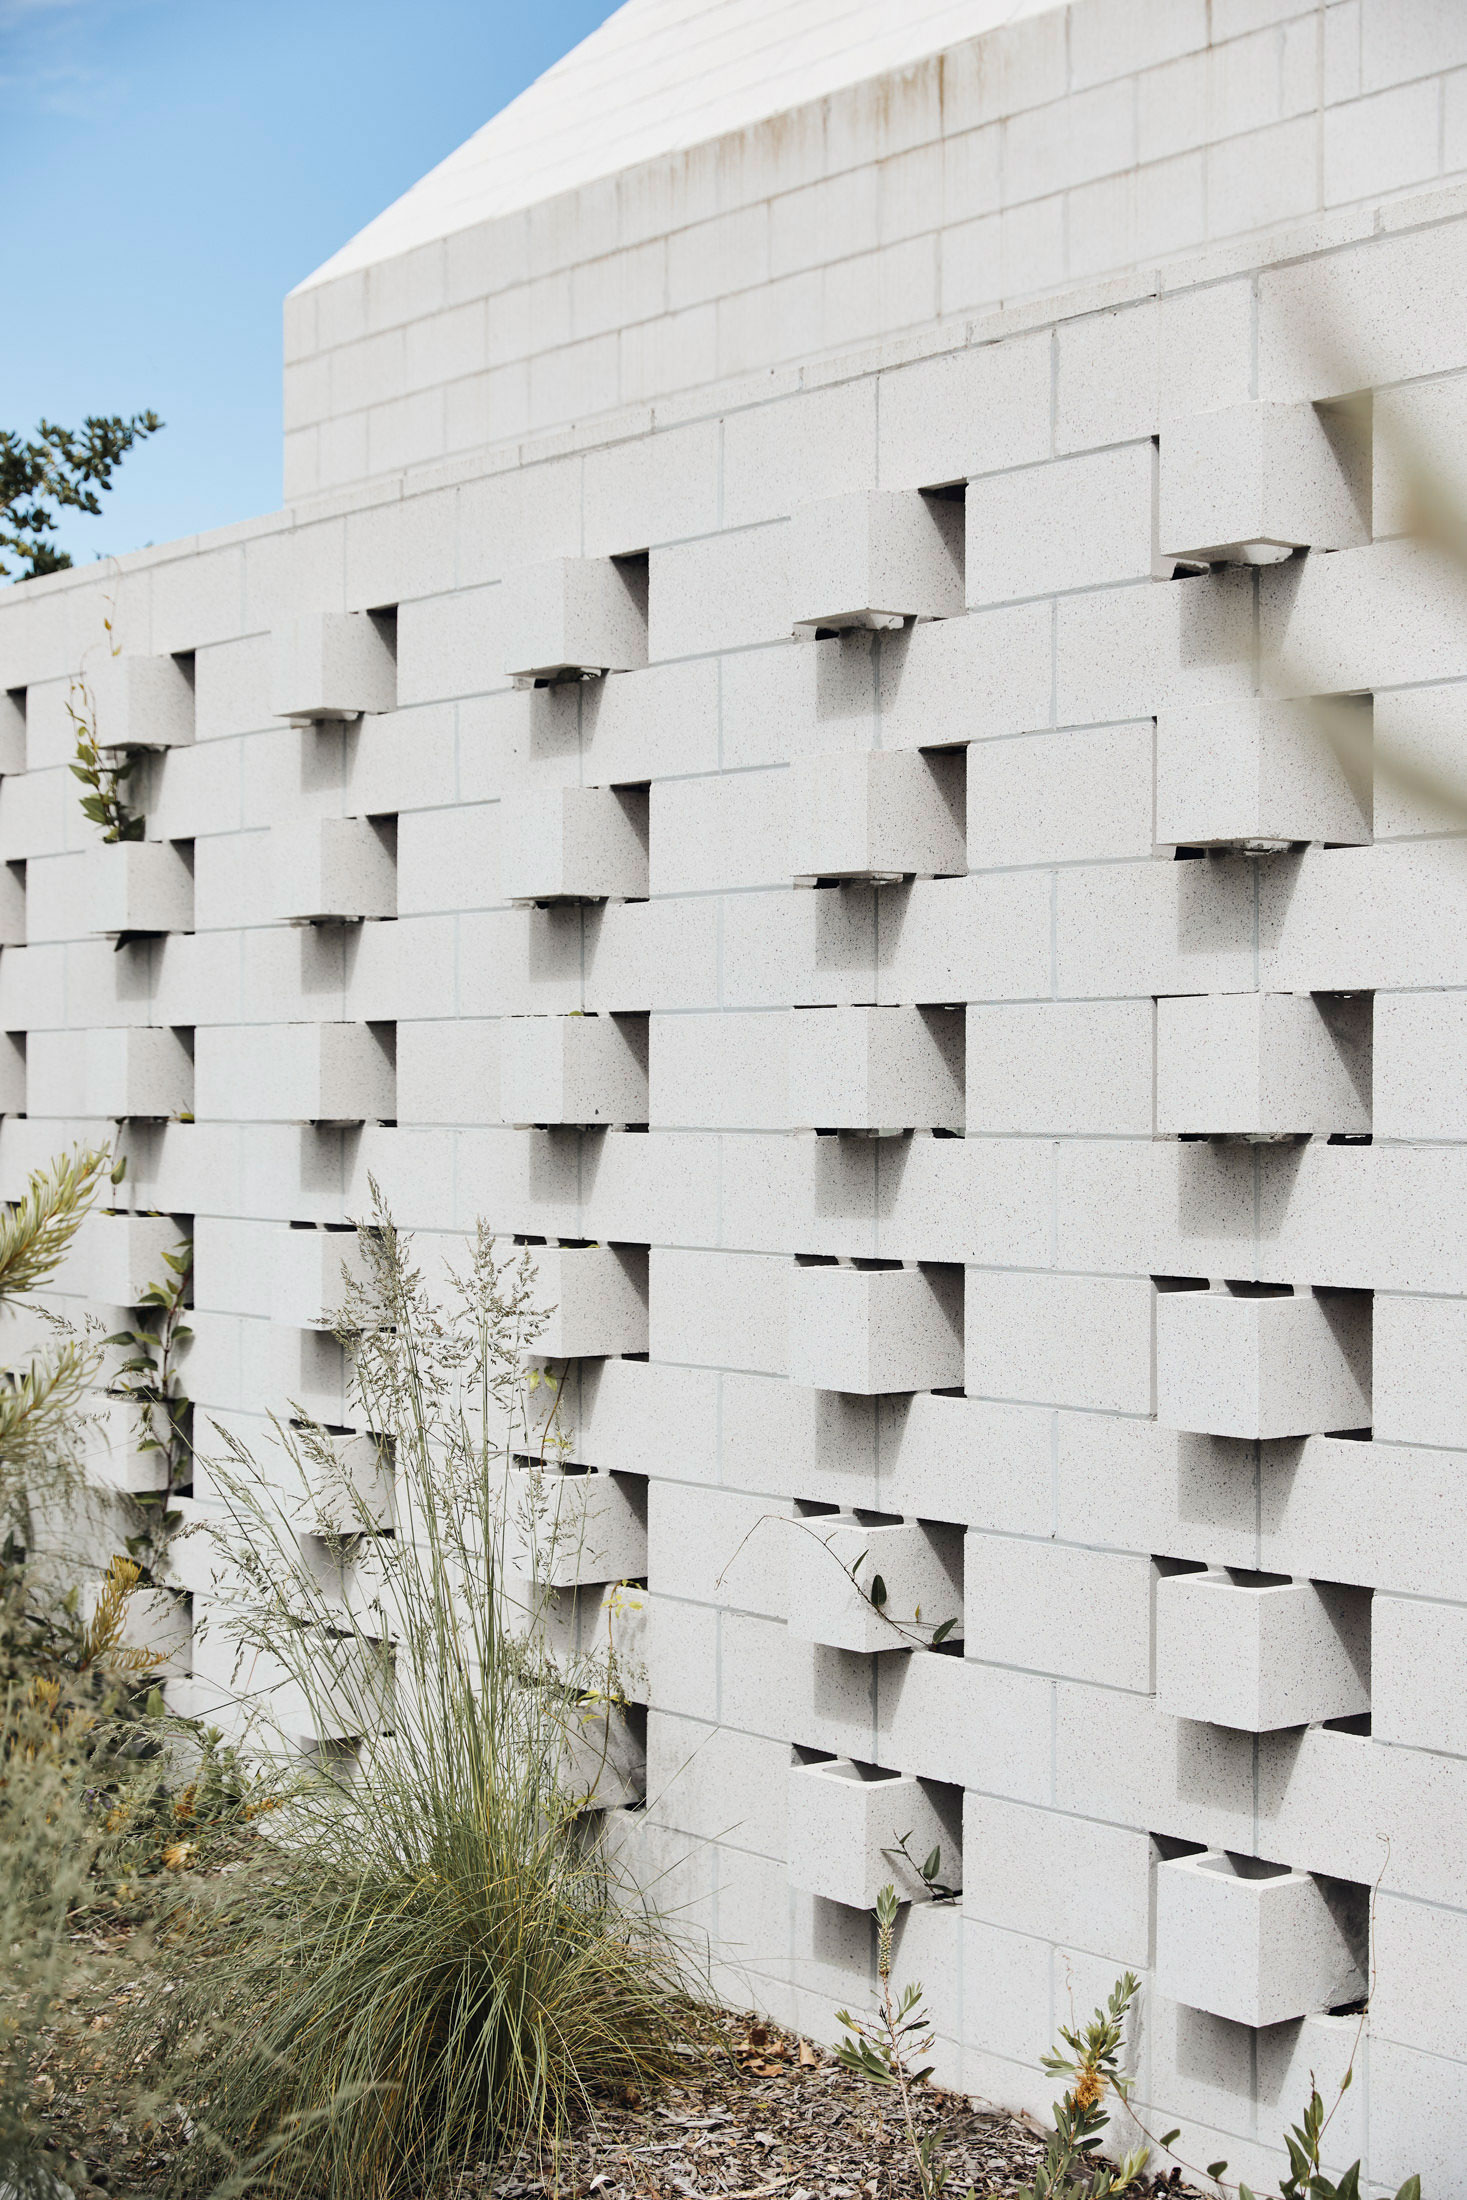 Architects Eat Bellows Beach House Flinders Masonry Architecture Photo Derek Swalwell Yellowtrace 07